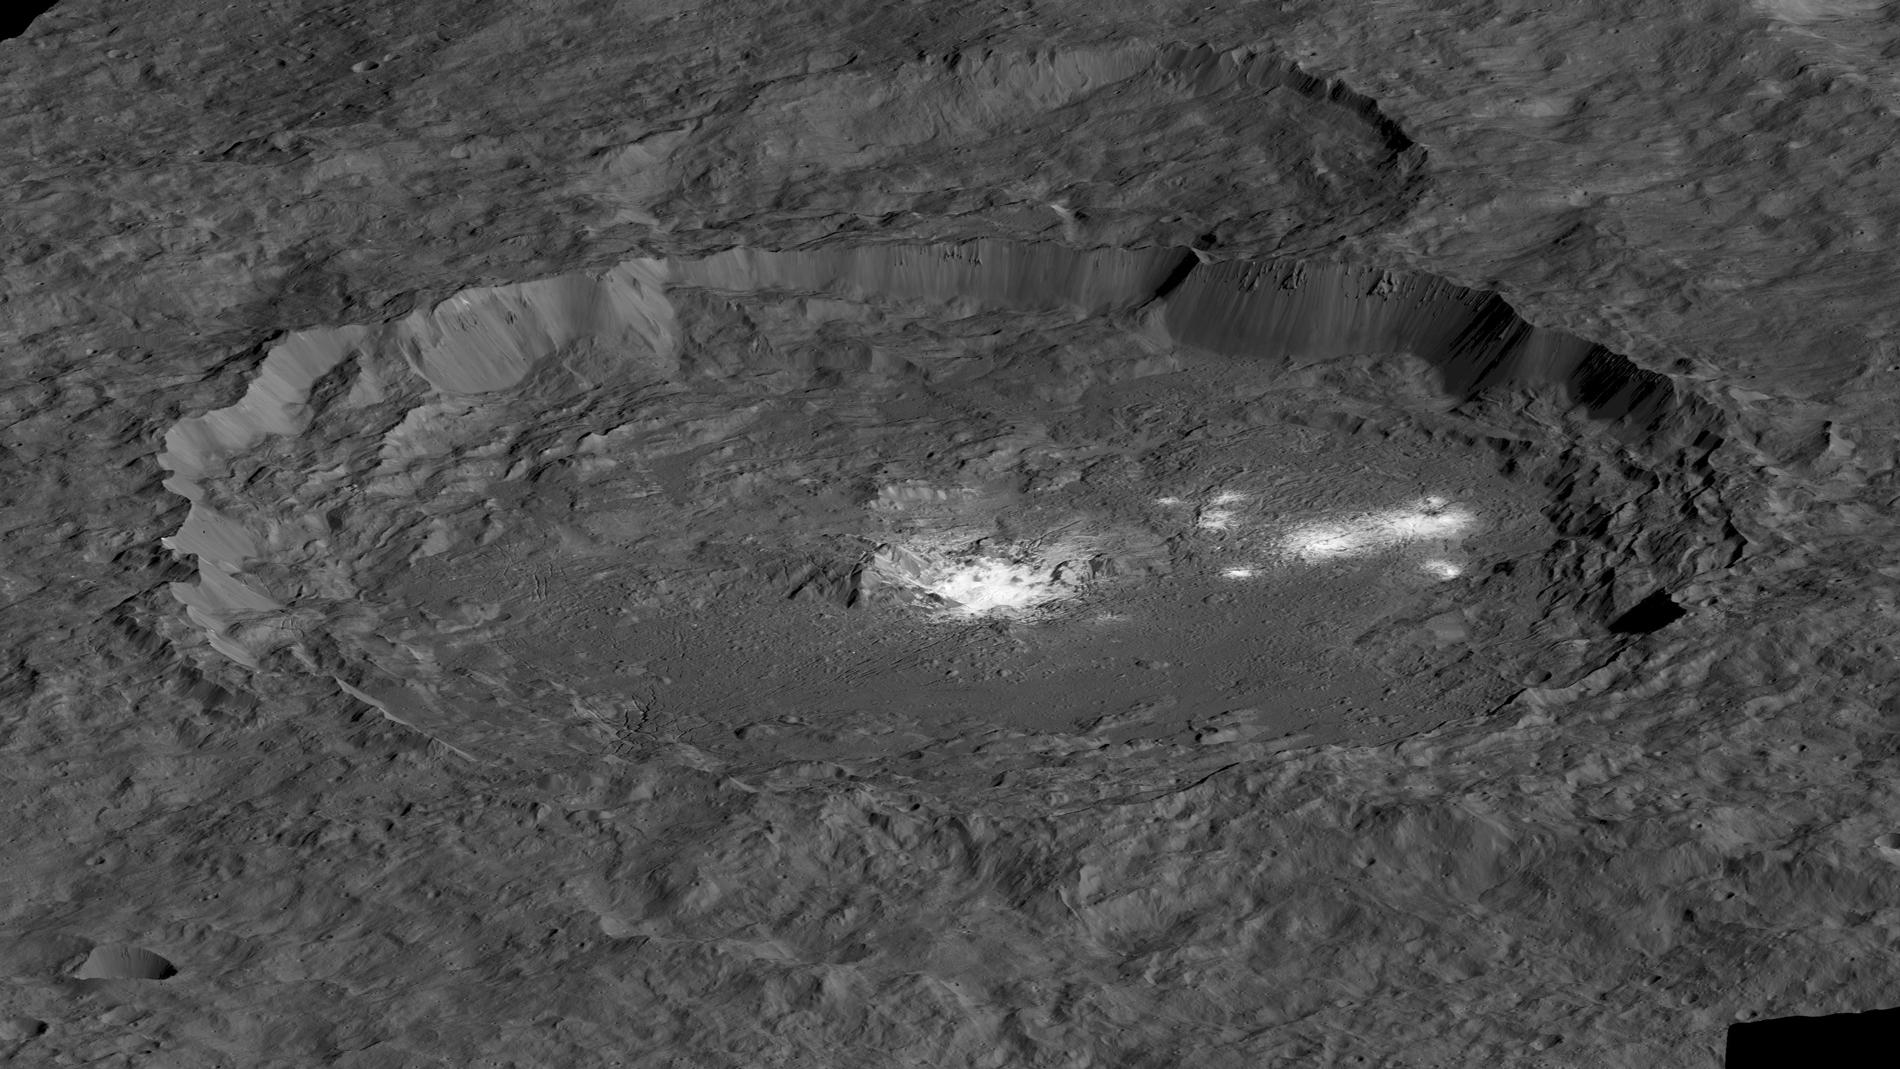 Le cratère Occator